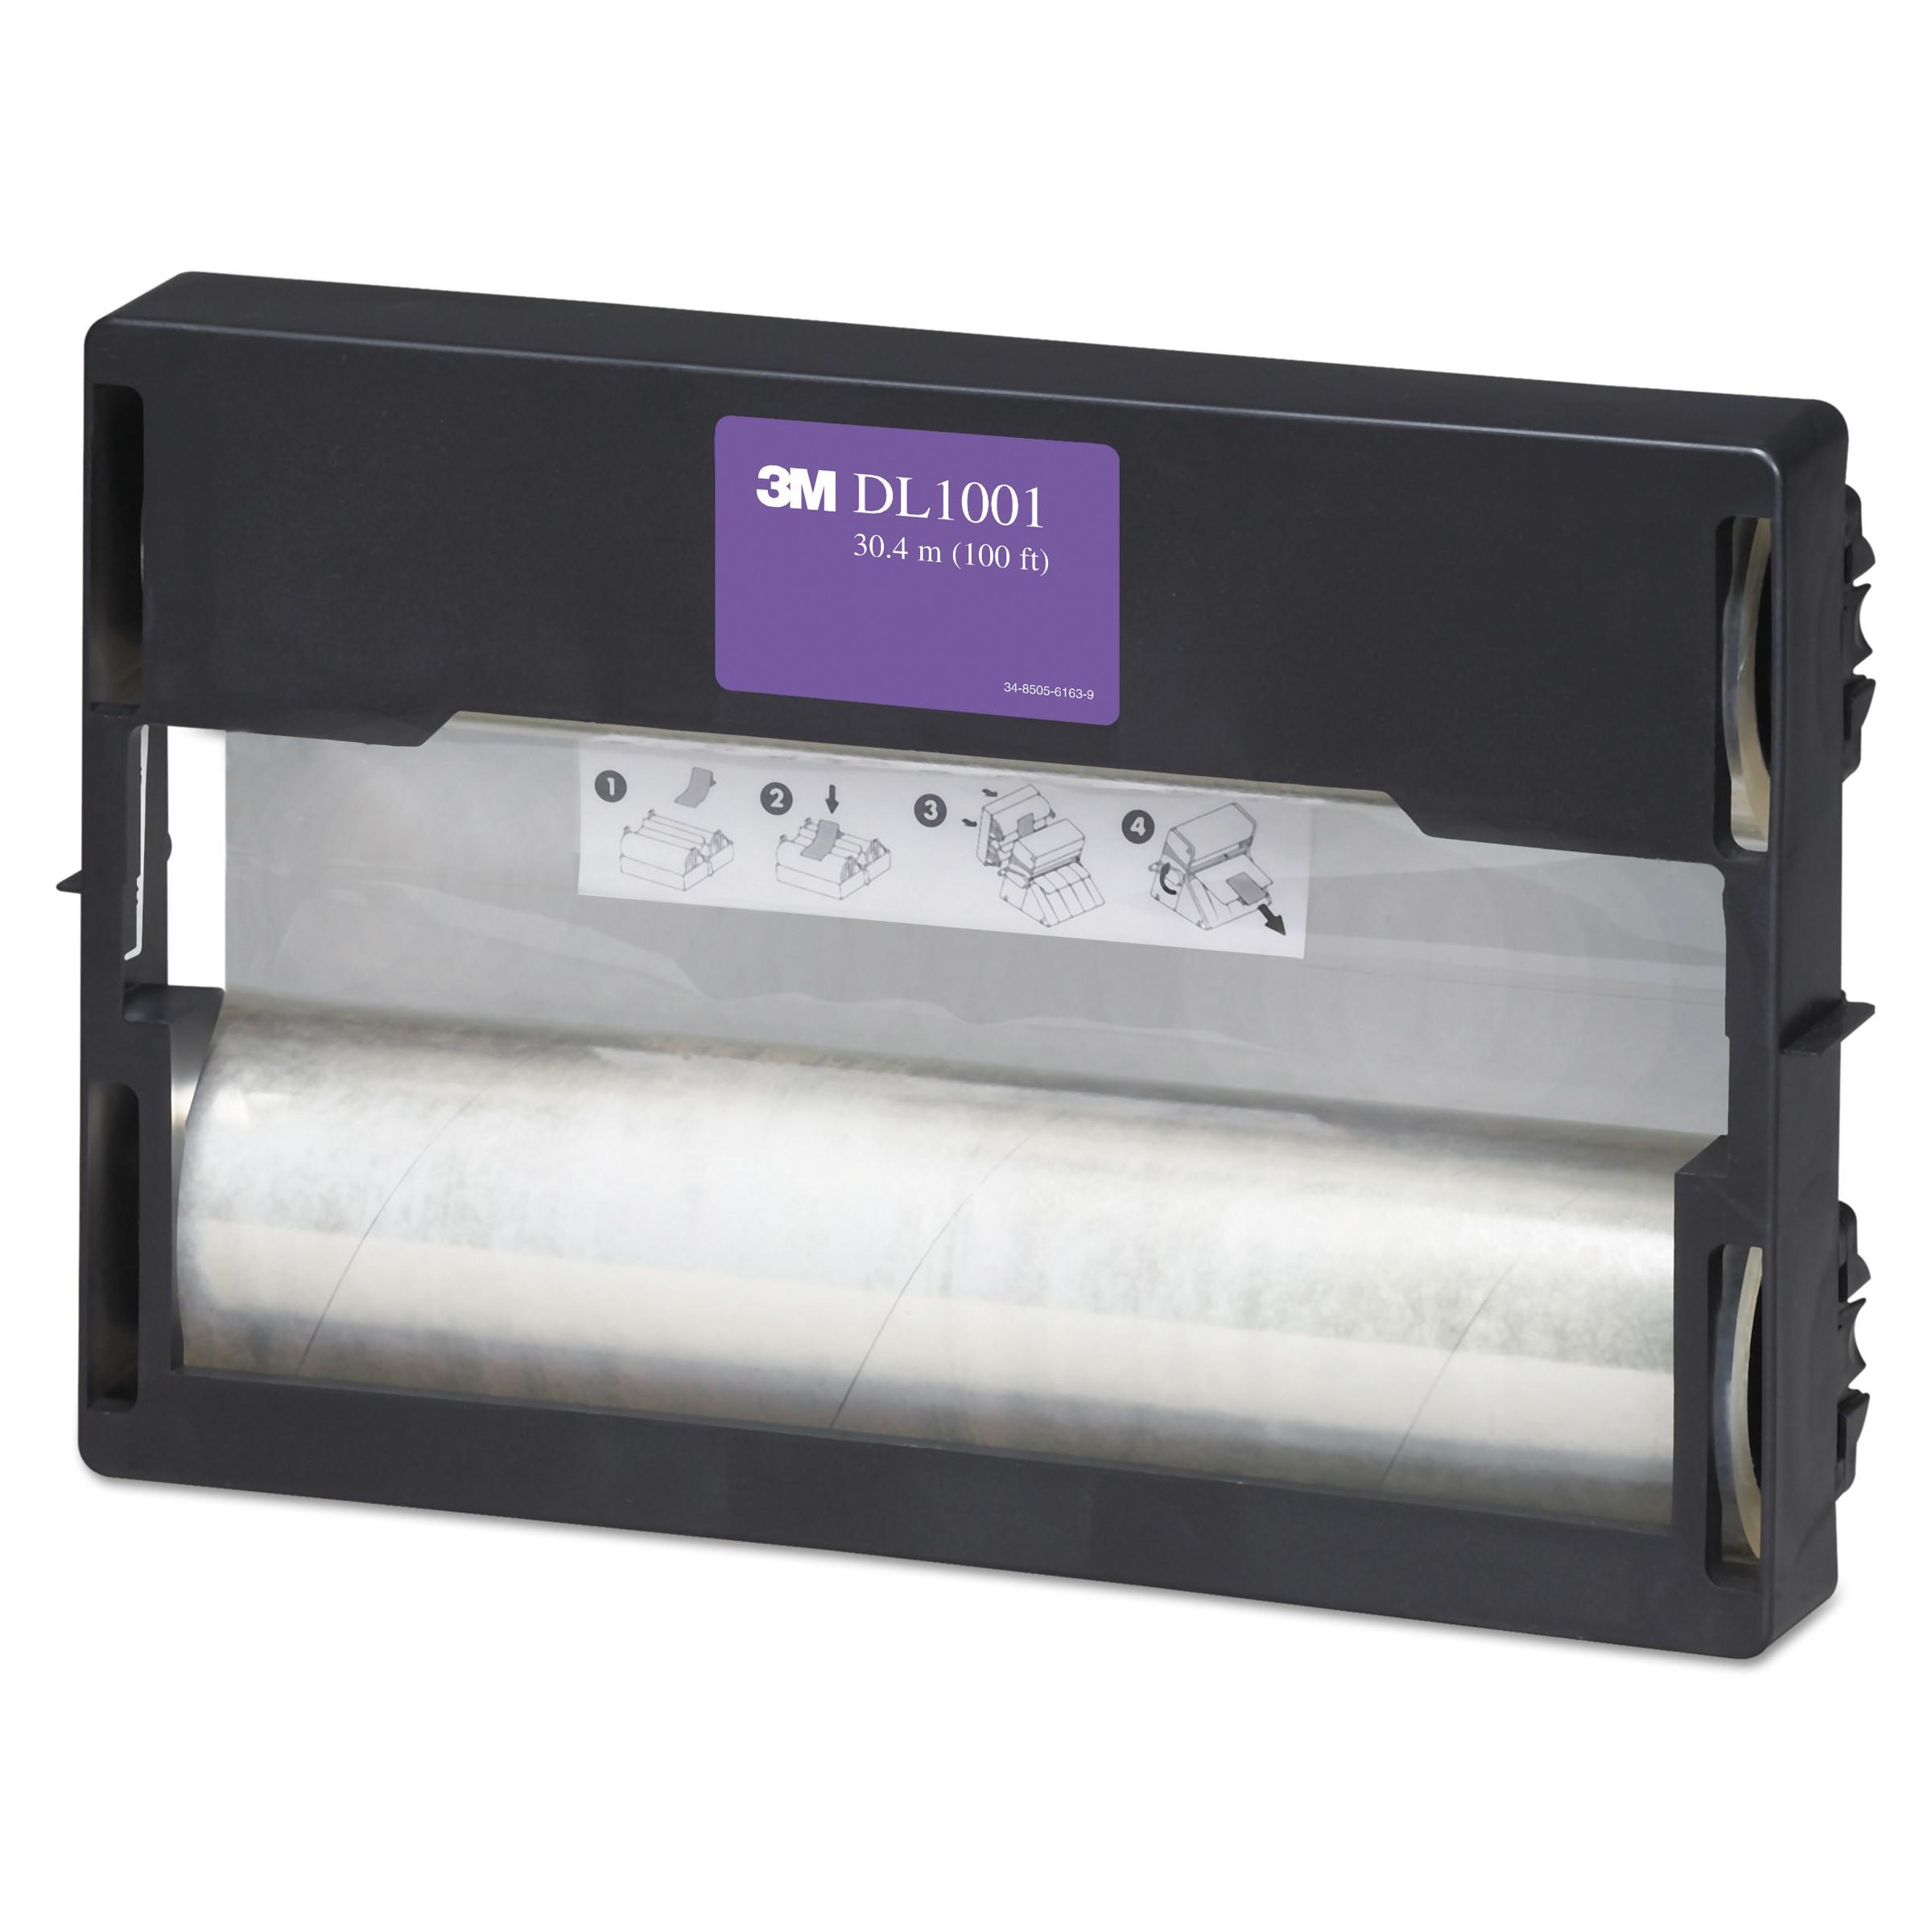 3M Refill Rolls for Heat-Free Laminating Machines, 100 ft. -MMMDL1001